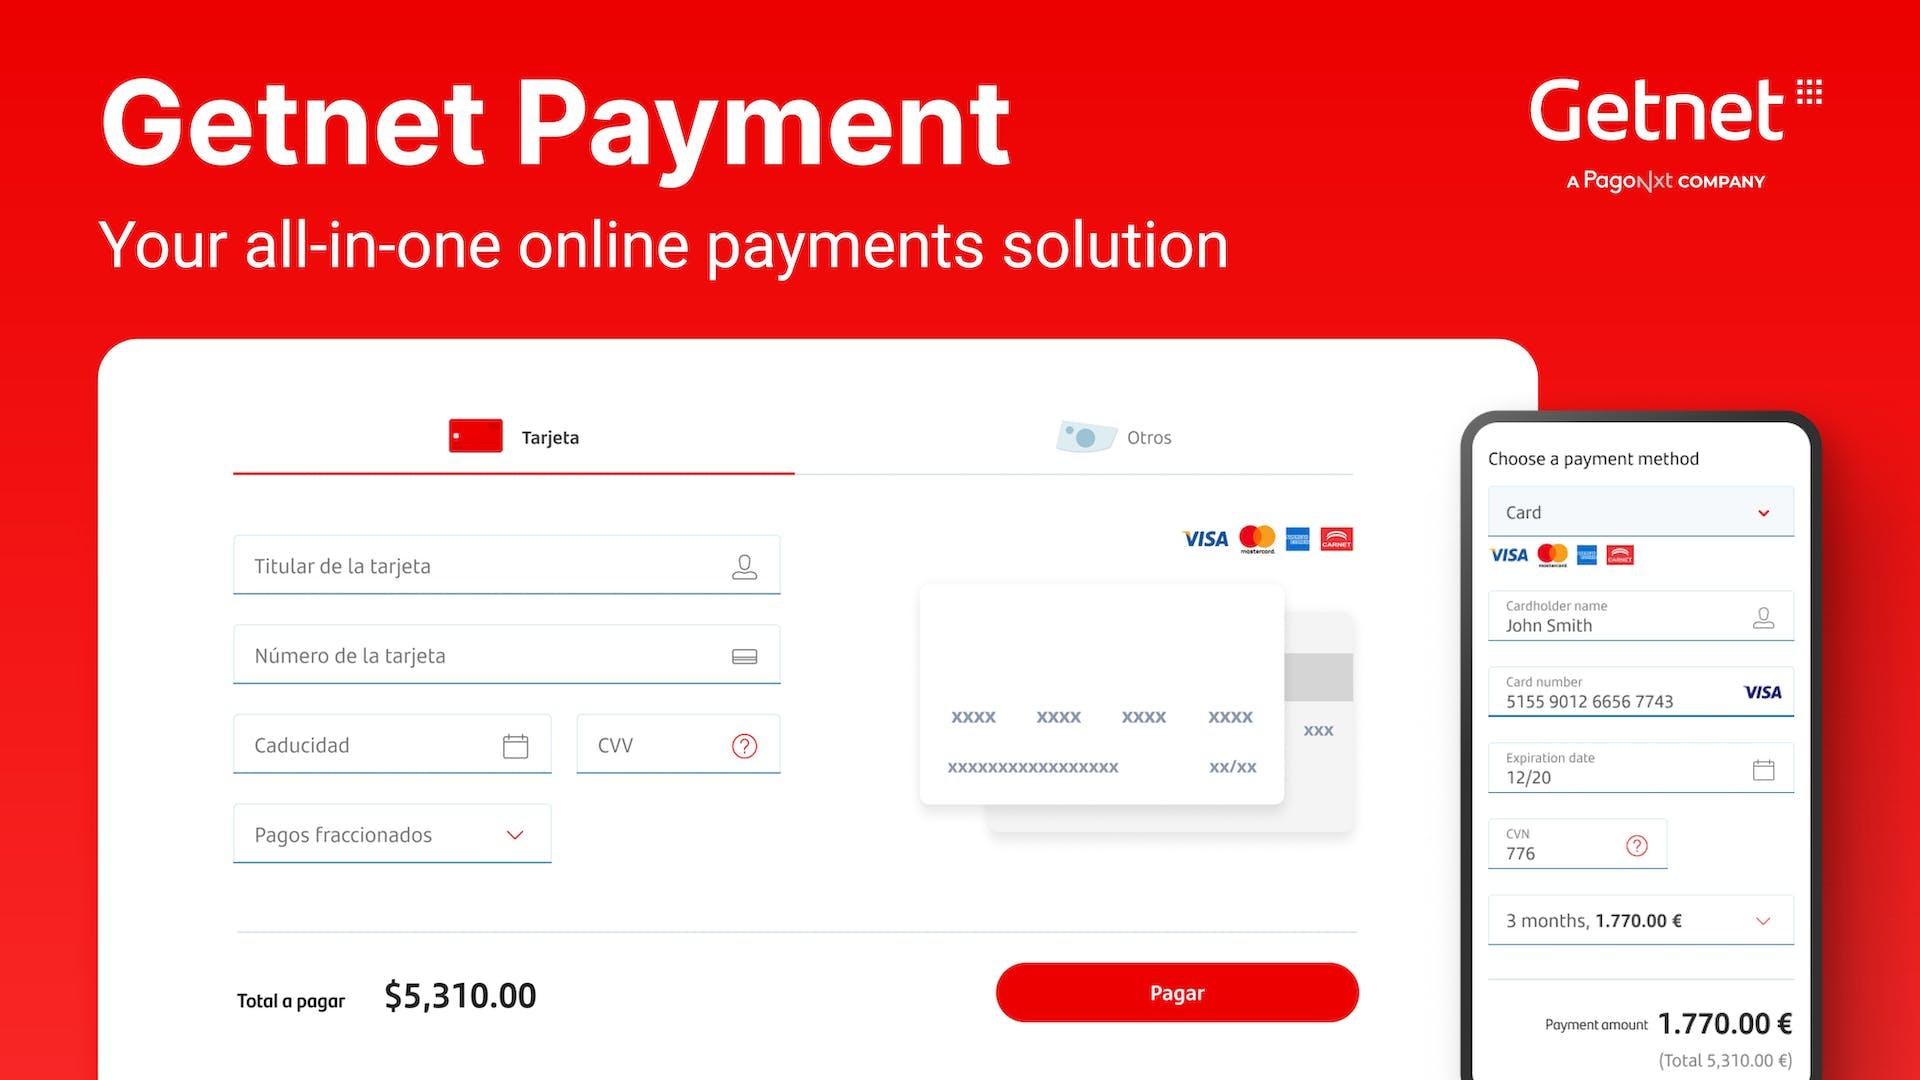 Getnet global payment